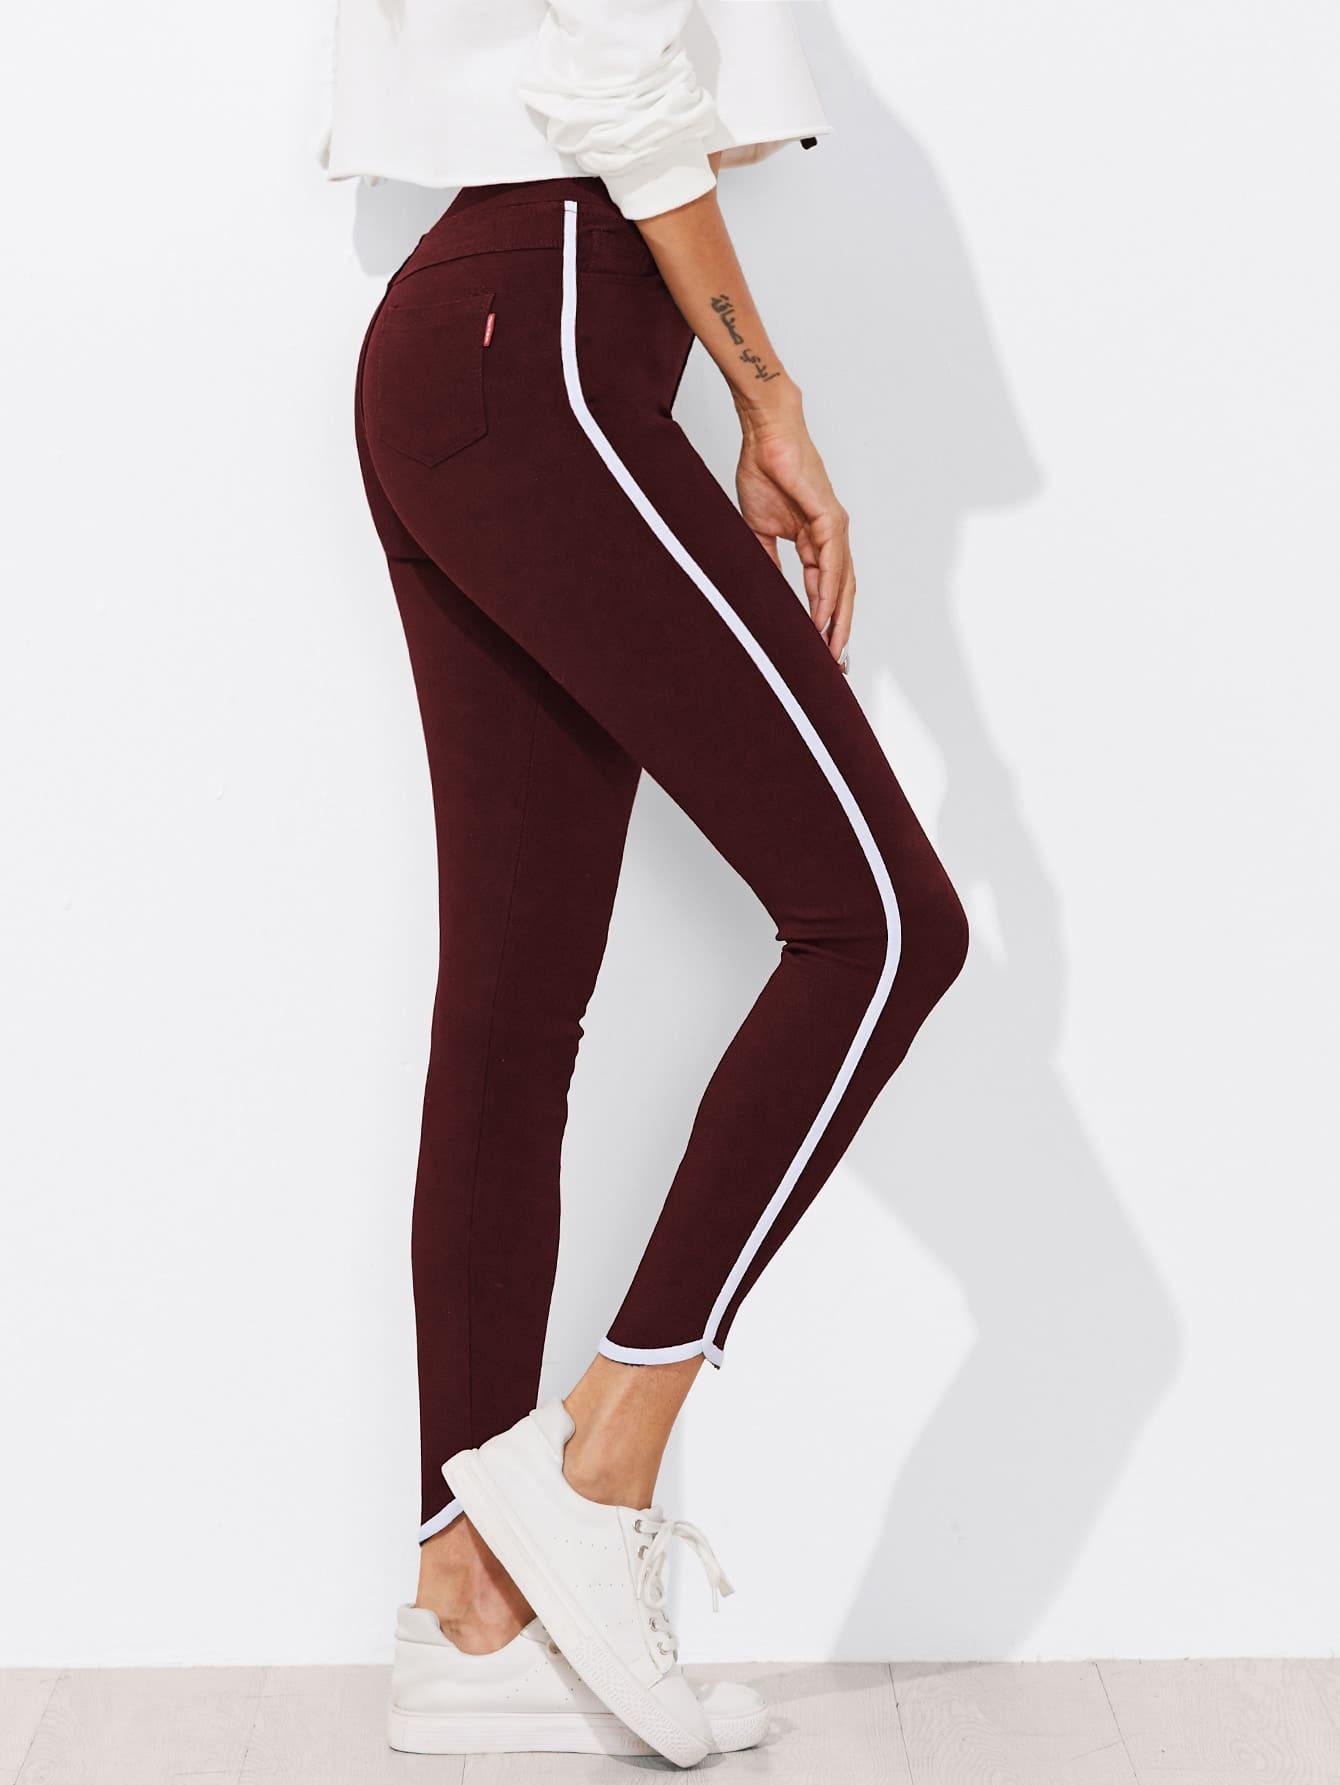 Contrast Trim Skinny Ankle Jeans